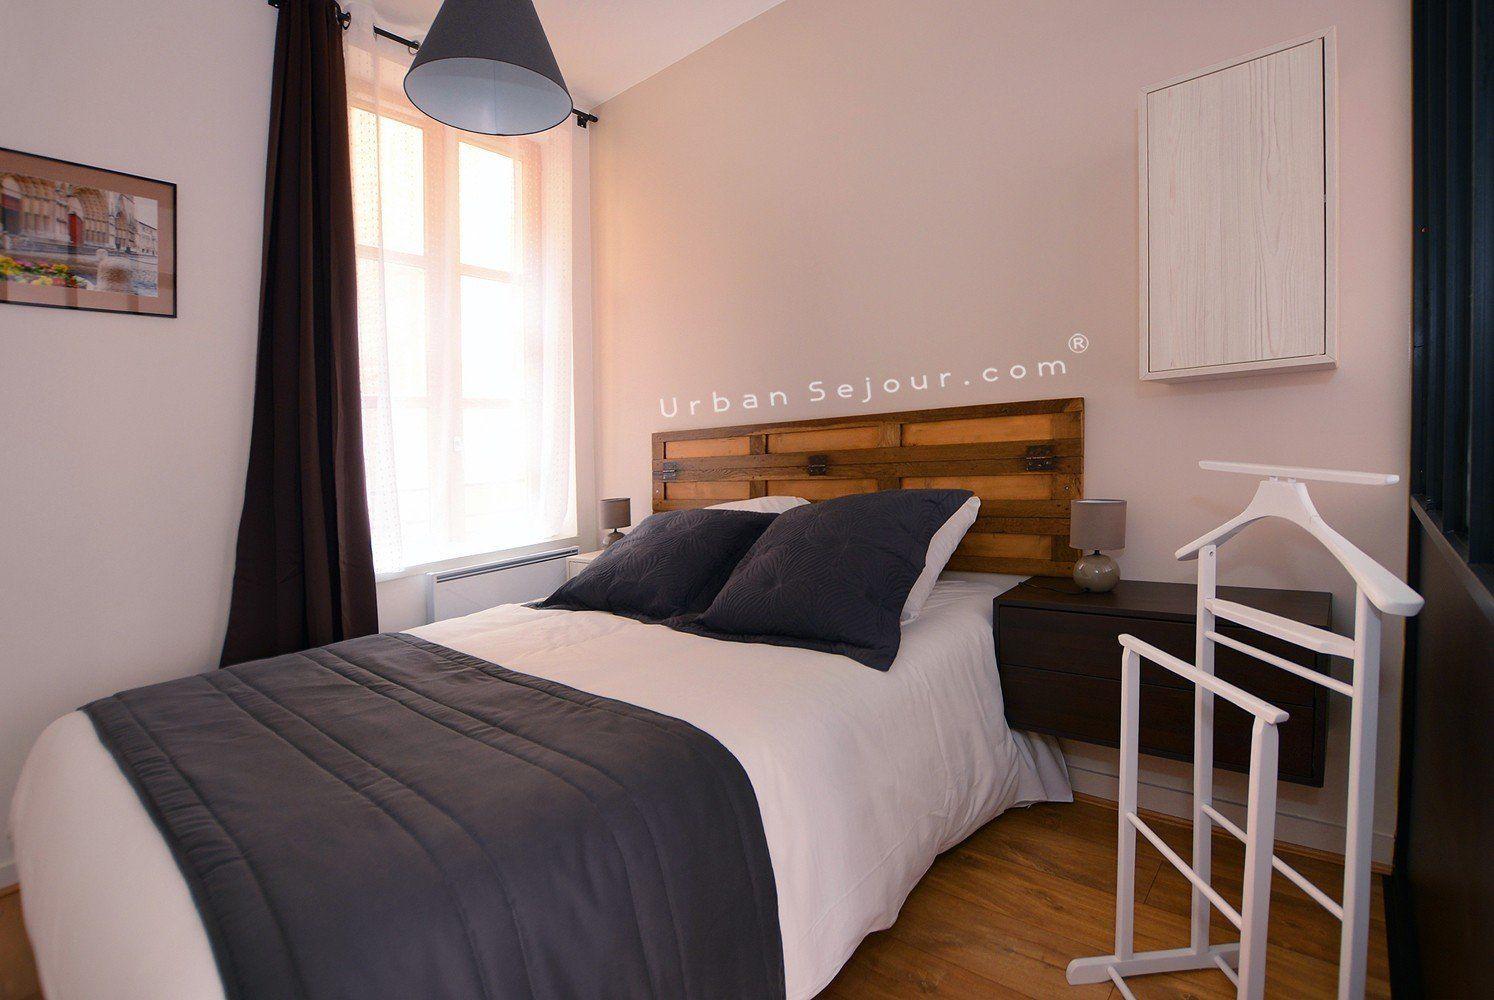 Location appartement meubl avec 1 chambre location saisonni re lyon 5 vieux lyon viel for Lyon chambre